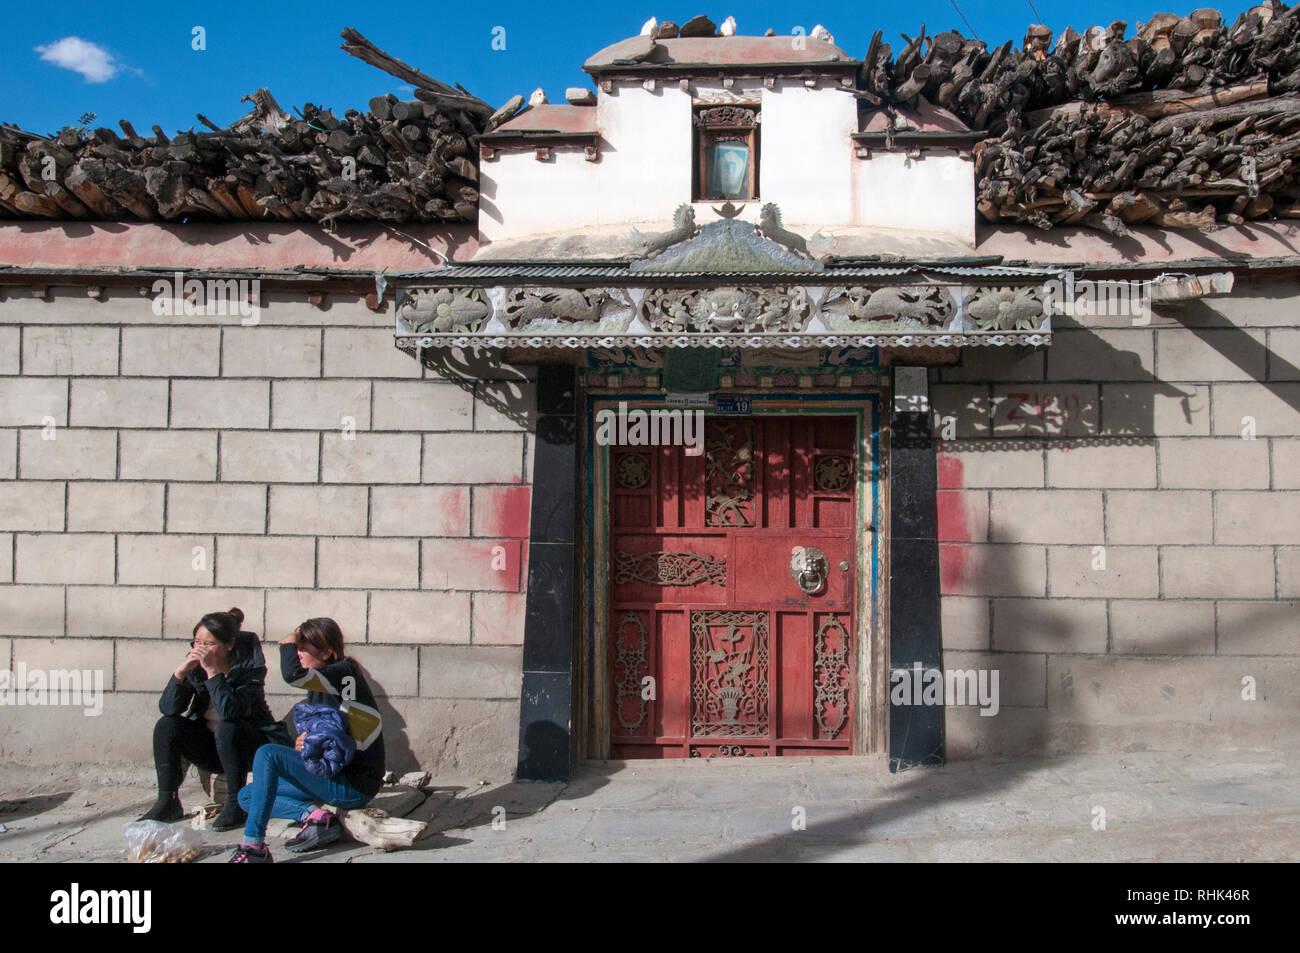 Ethnic Tibetans outside a traditional dwelling at Tsetang, Tibet, China - Stock Image